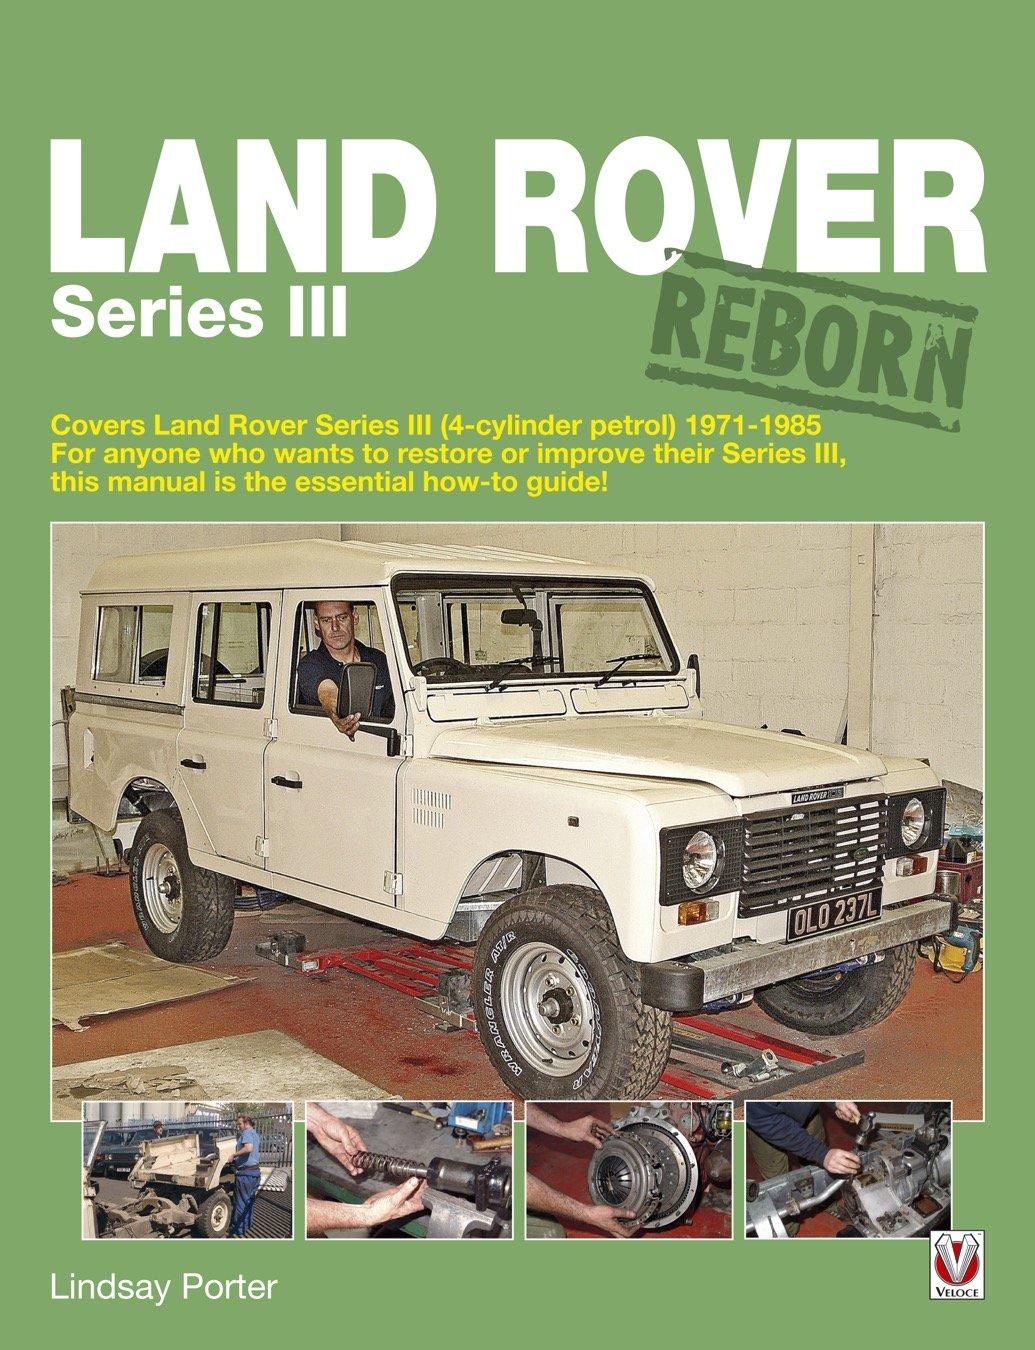 Land Rover Series Iii Reborn Lindsay Porter 9781845843472 Amazon Defender Parts Catalogue Books